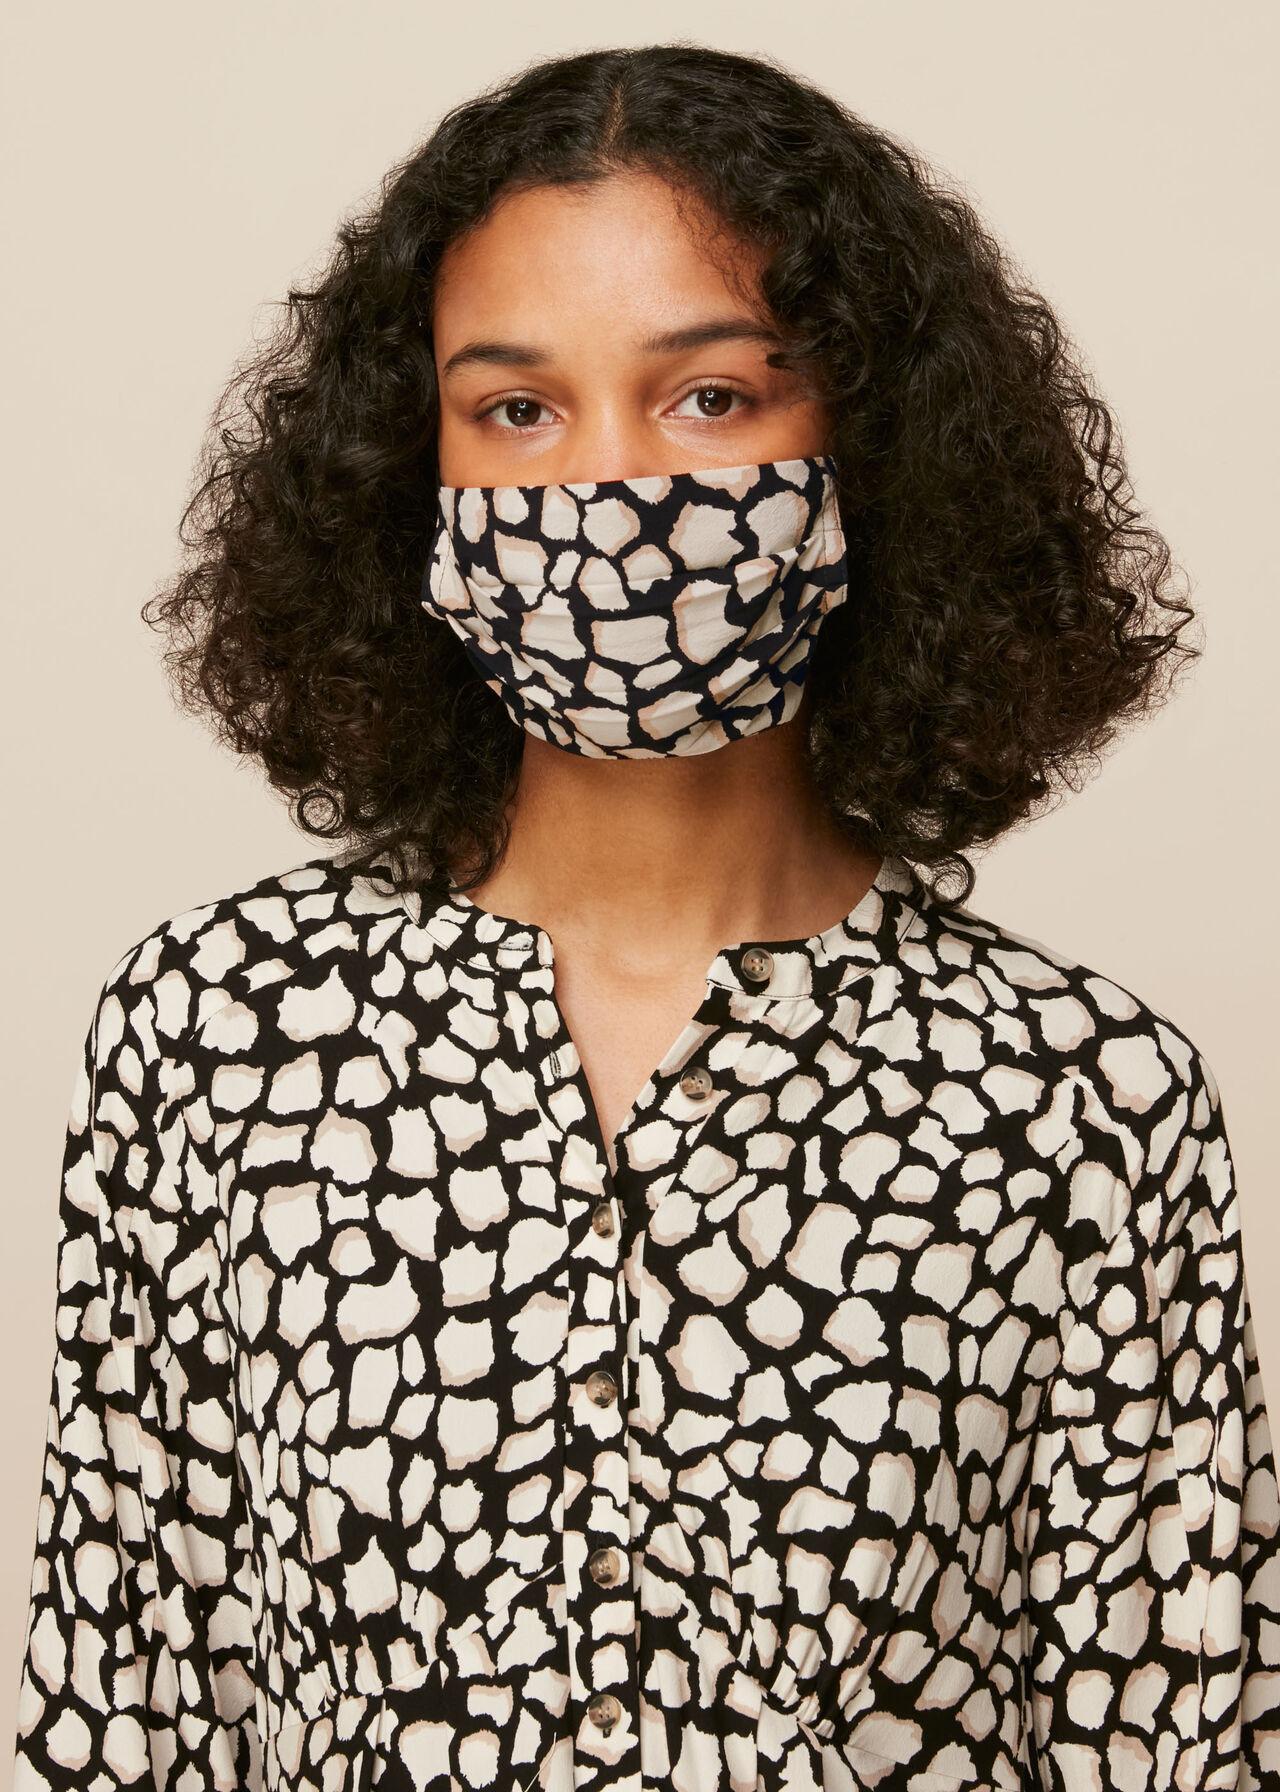 Giraffe Print Face Covering